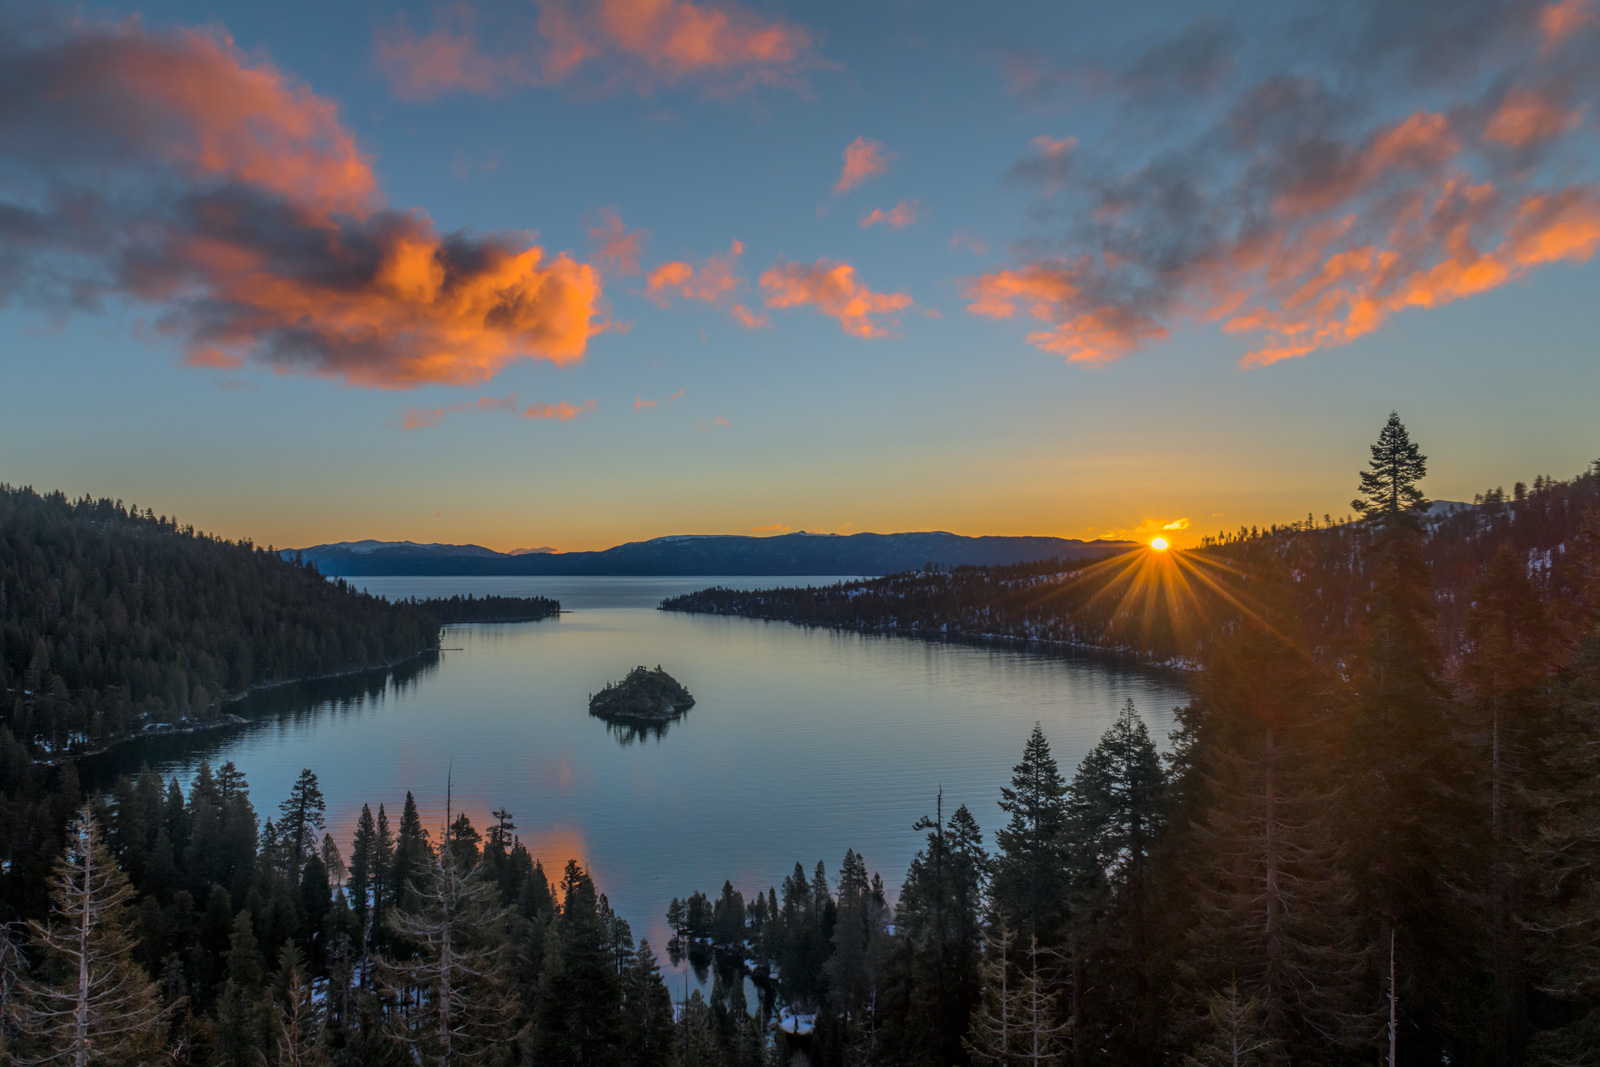 California, Lake, Tahoe, Emerald, Bay, Sunrise, limited edition, photograph, fine art, landscape, photo